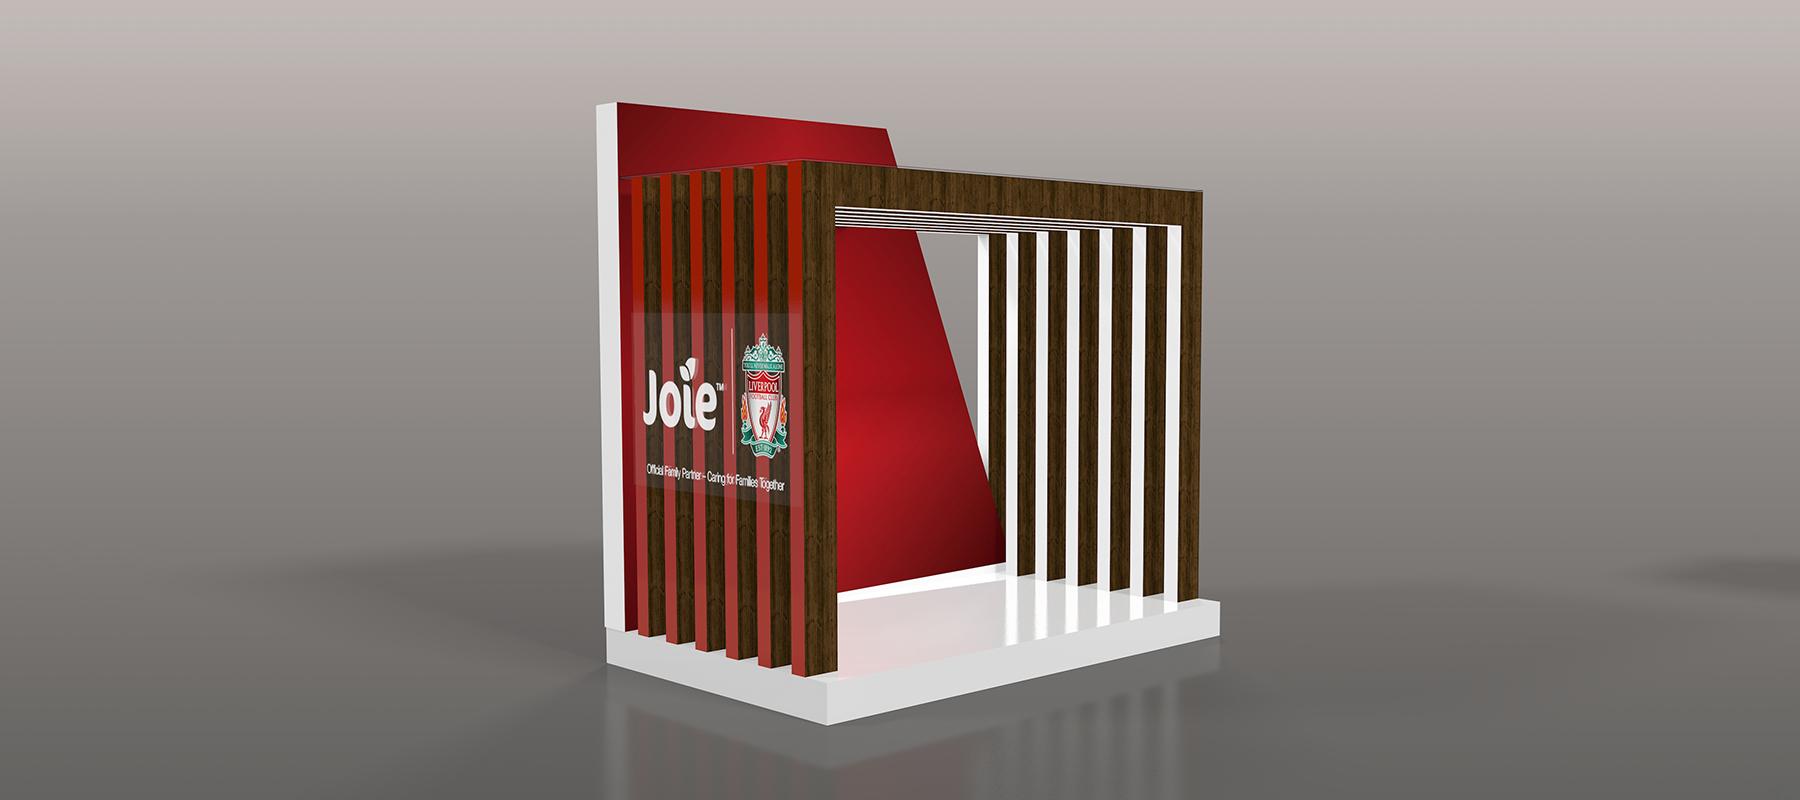 Joie Liverpool 1